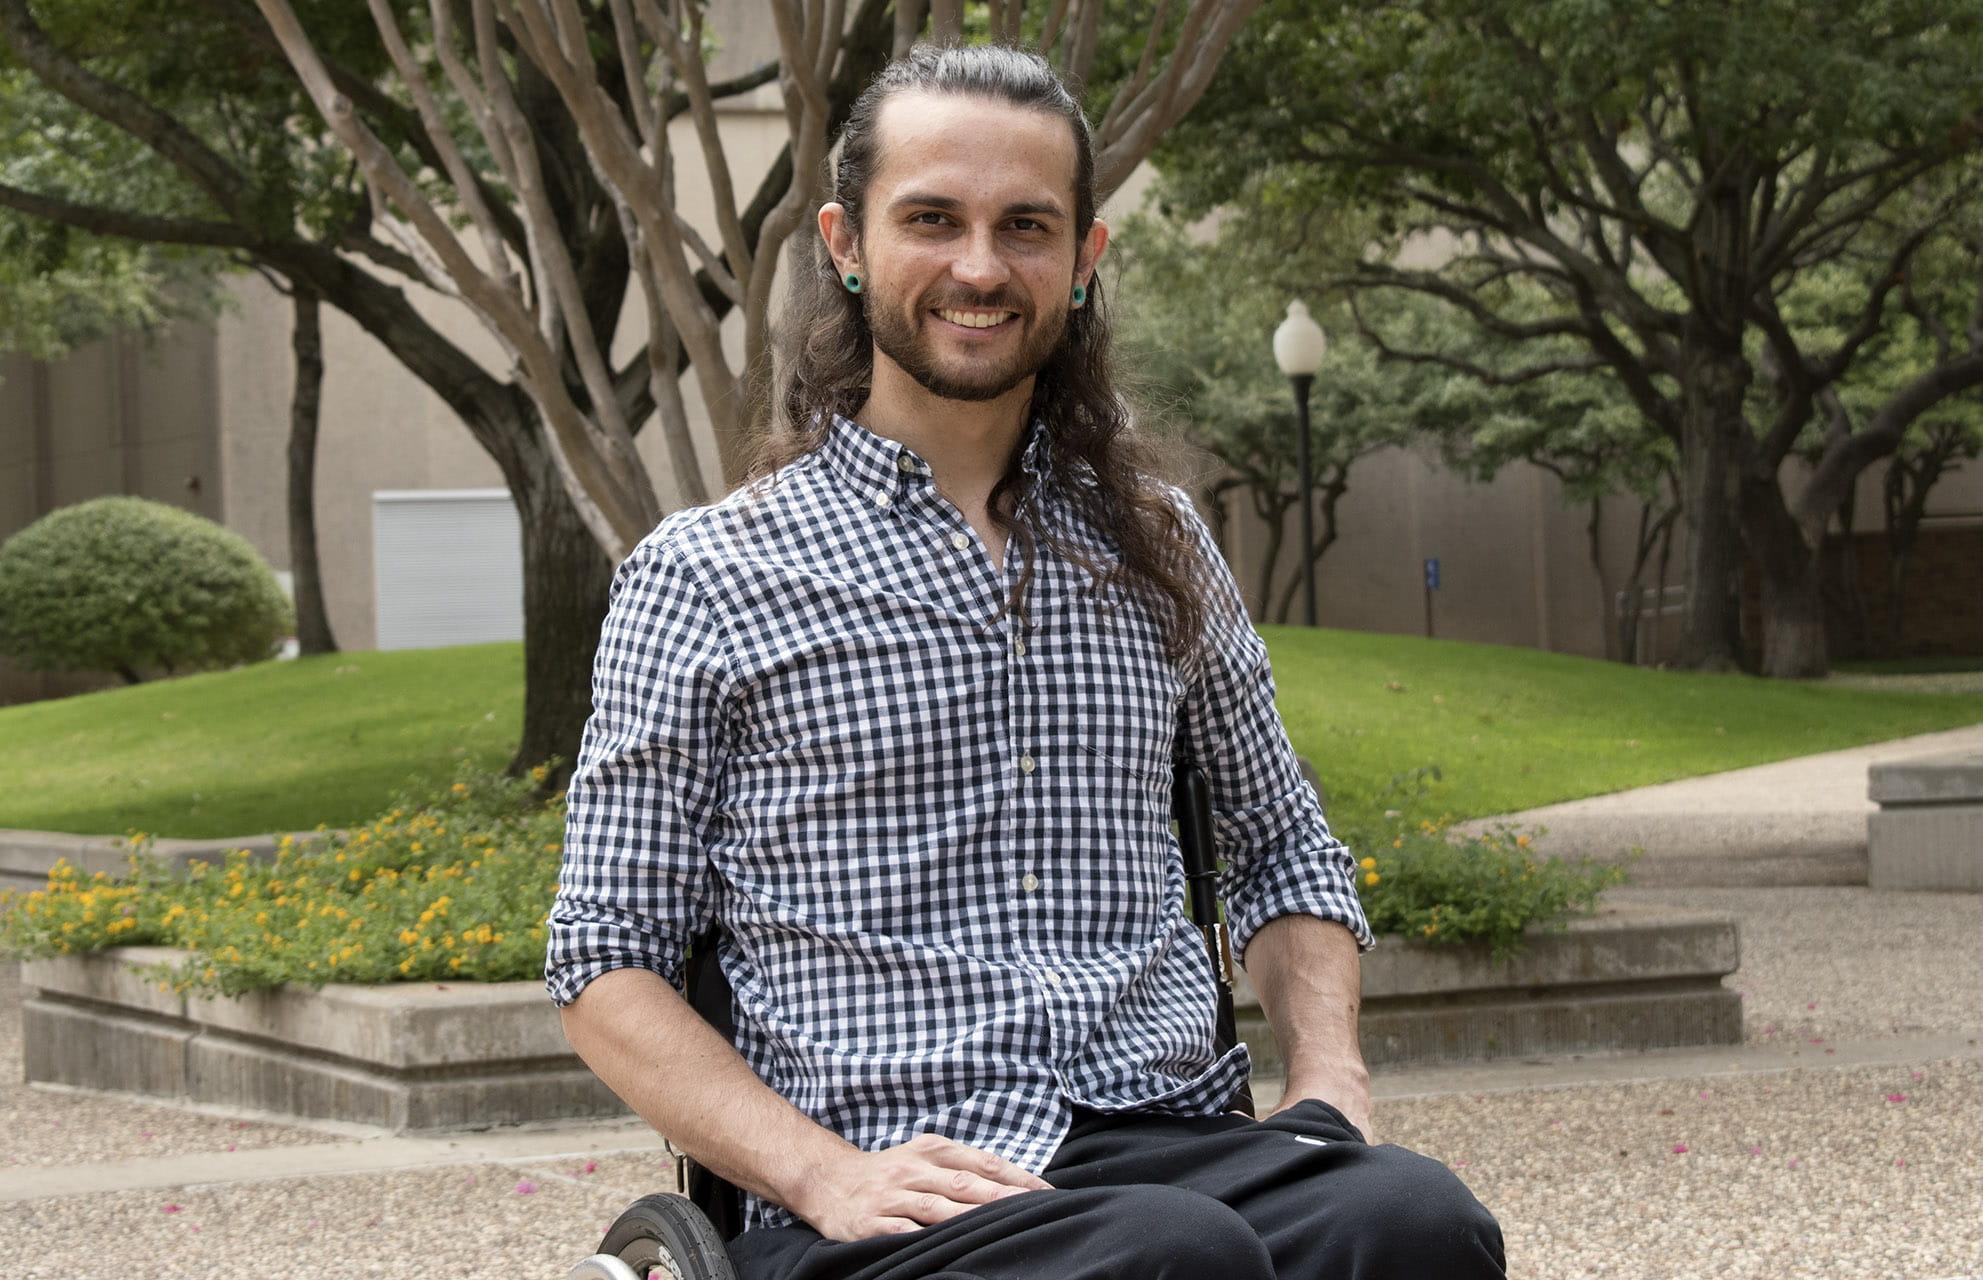 UTA electrical engineering student Jordan Baker